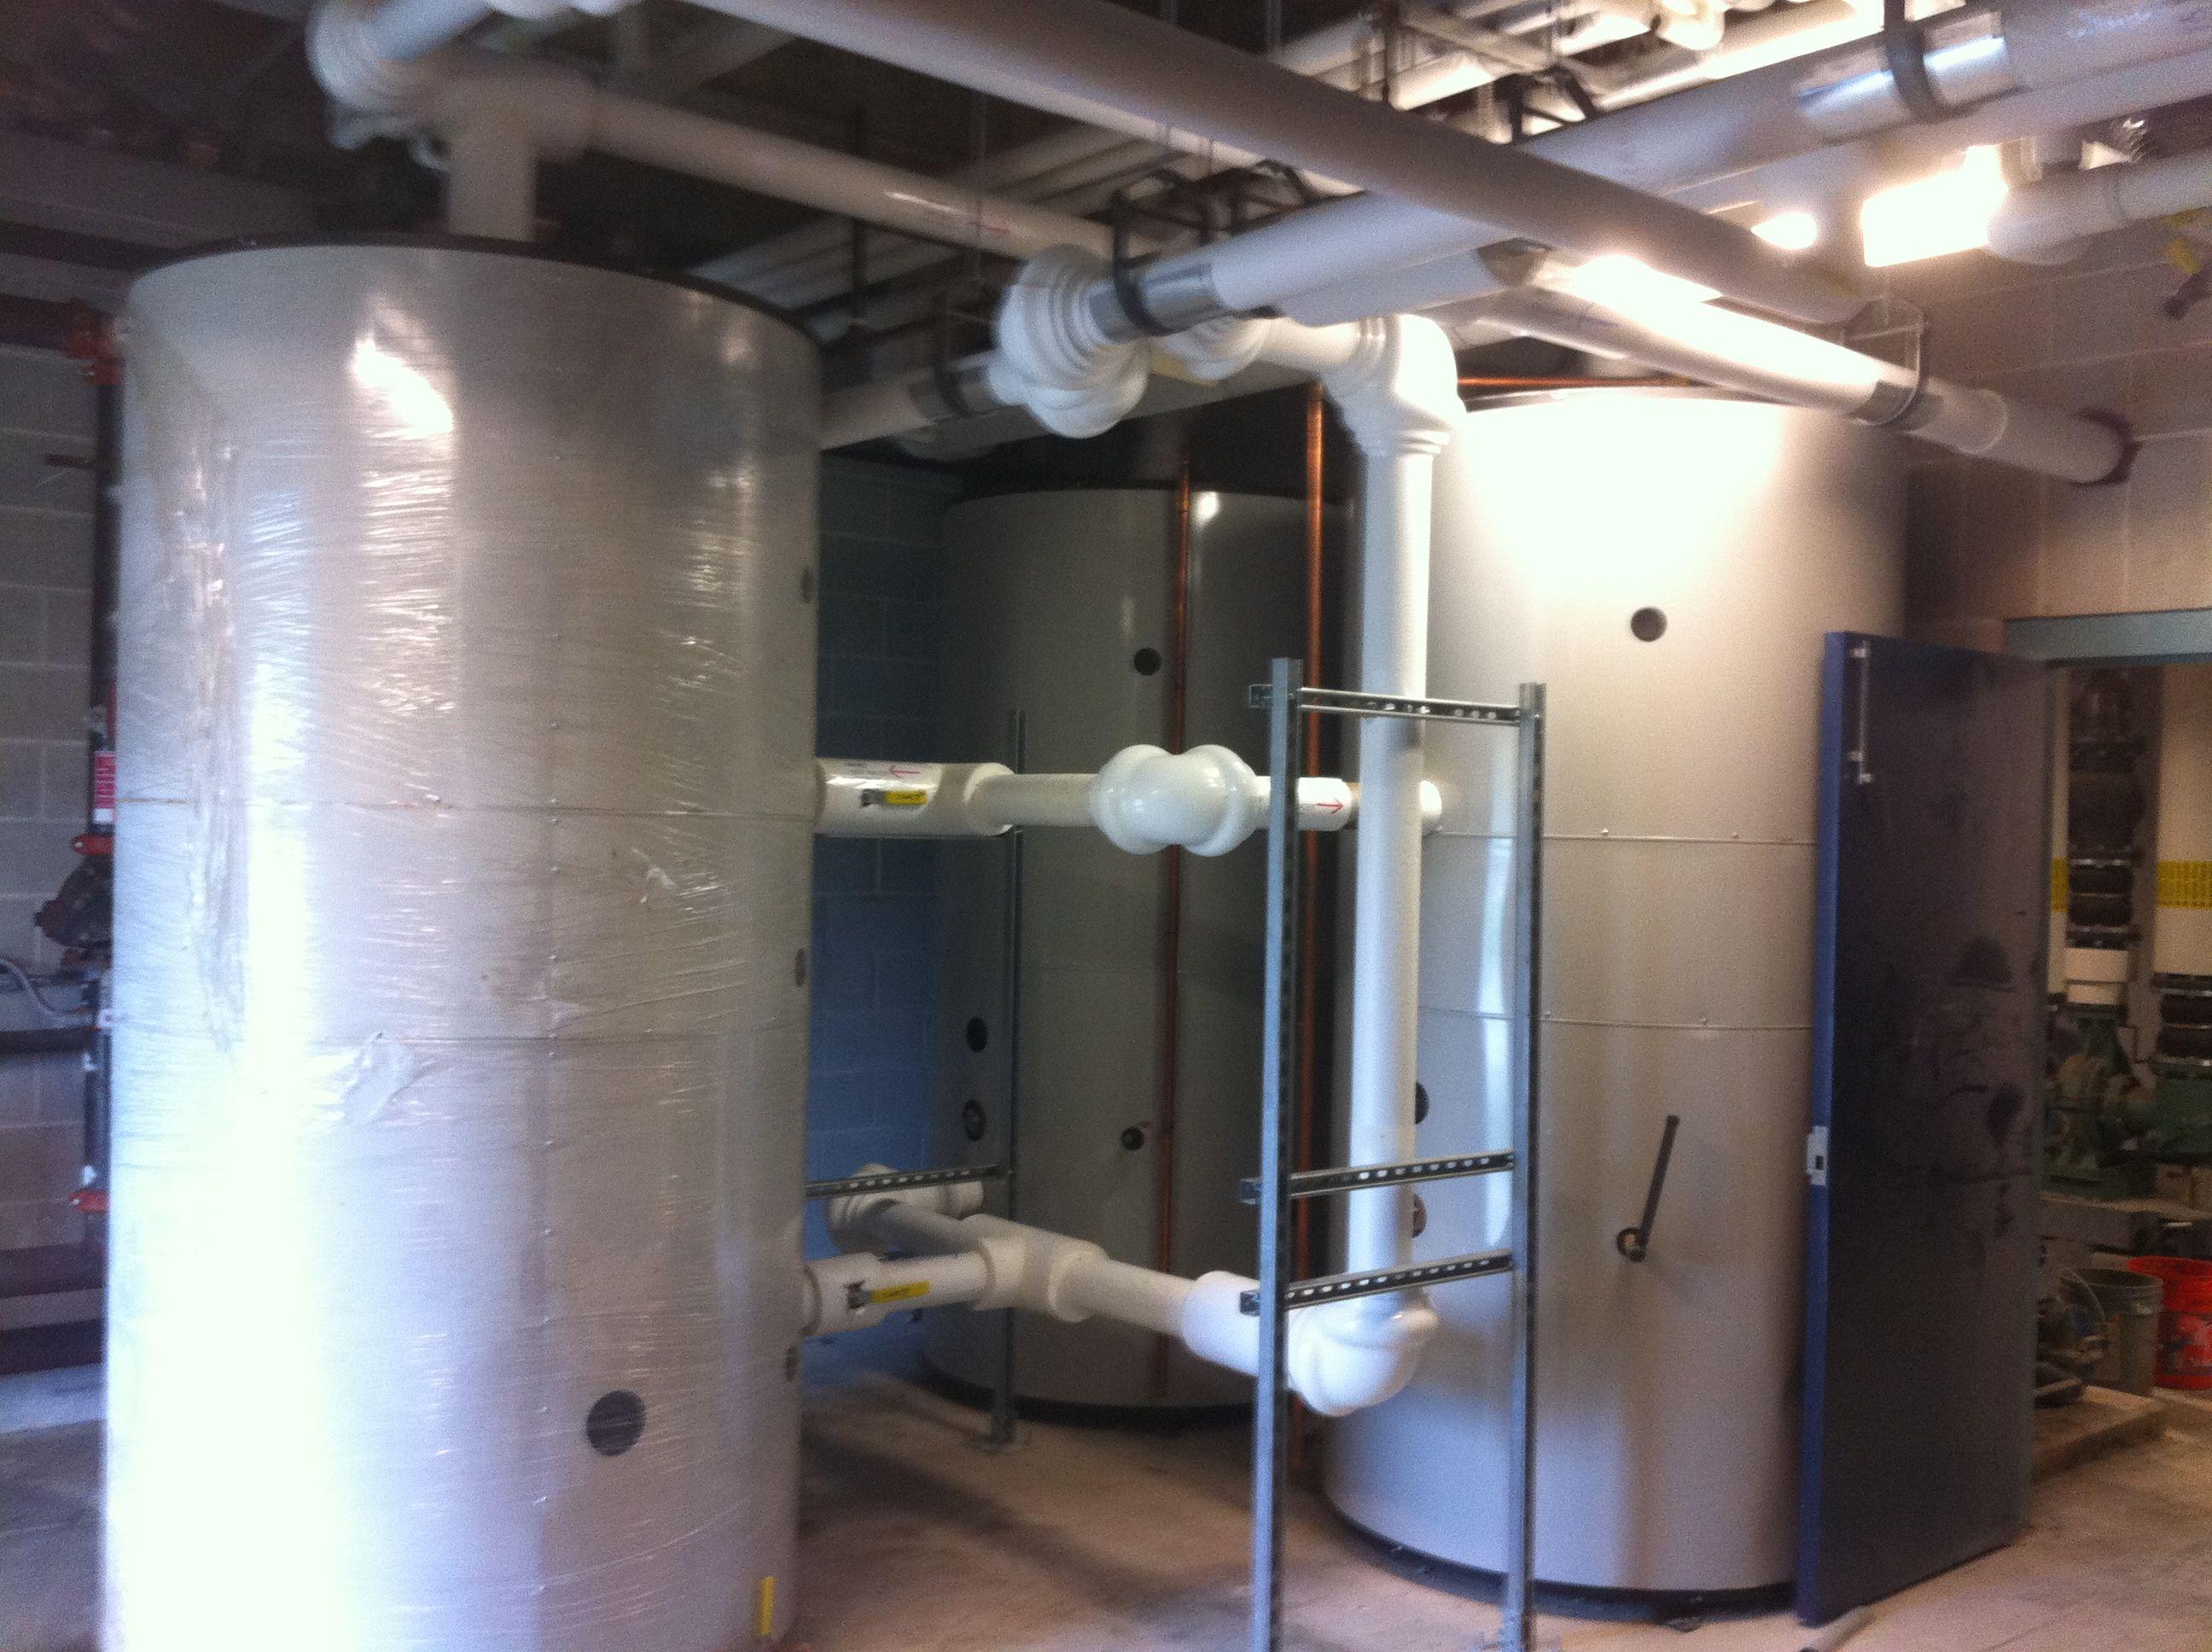 Solar Hot Water | Collectors, Tanks, Piping, Pumps | Shift Energy LLC